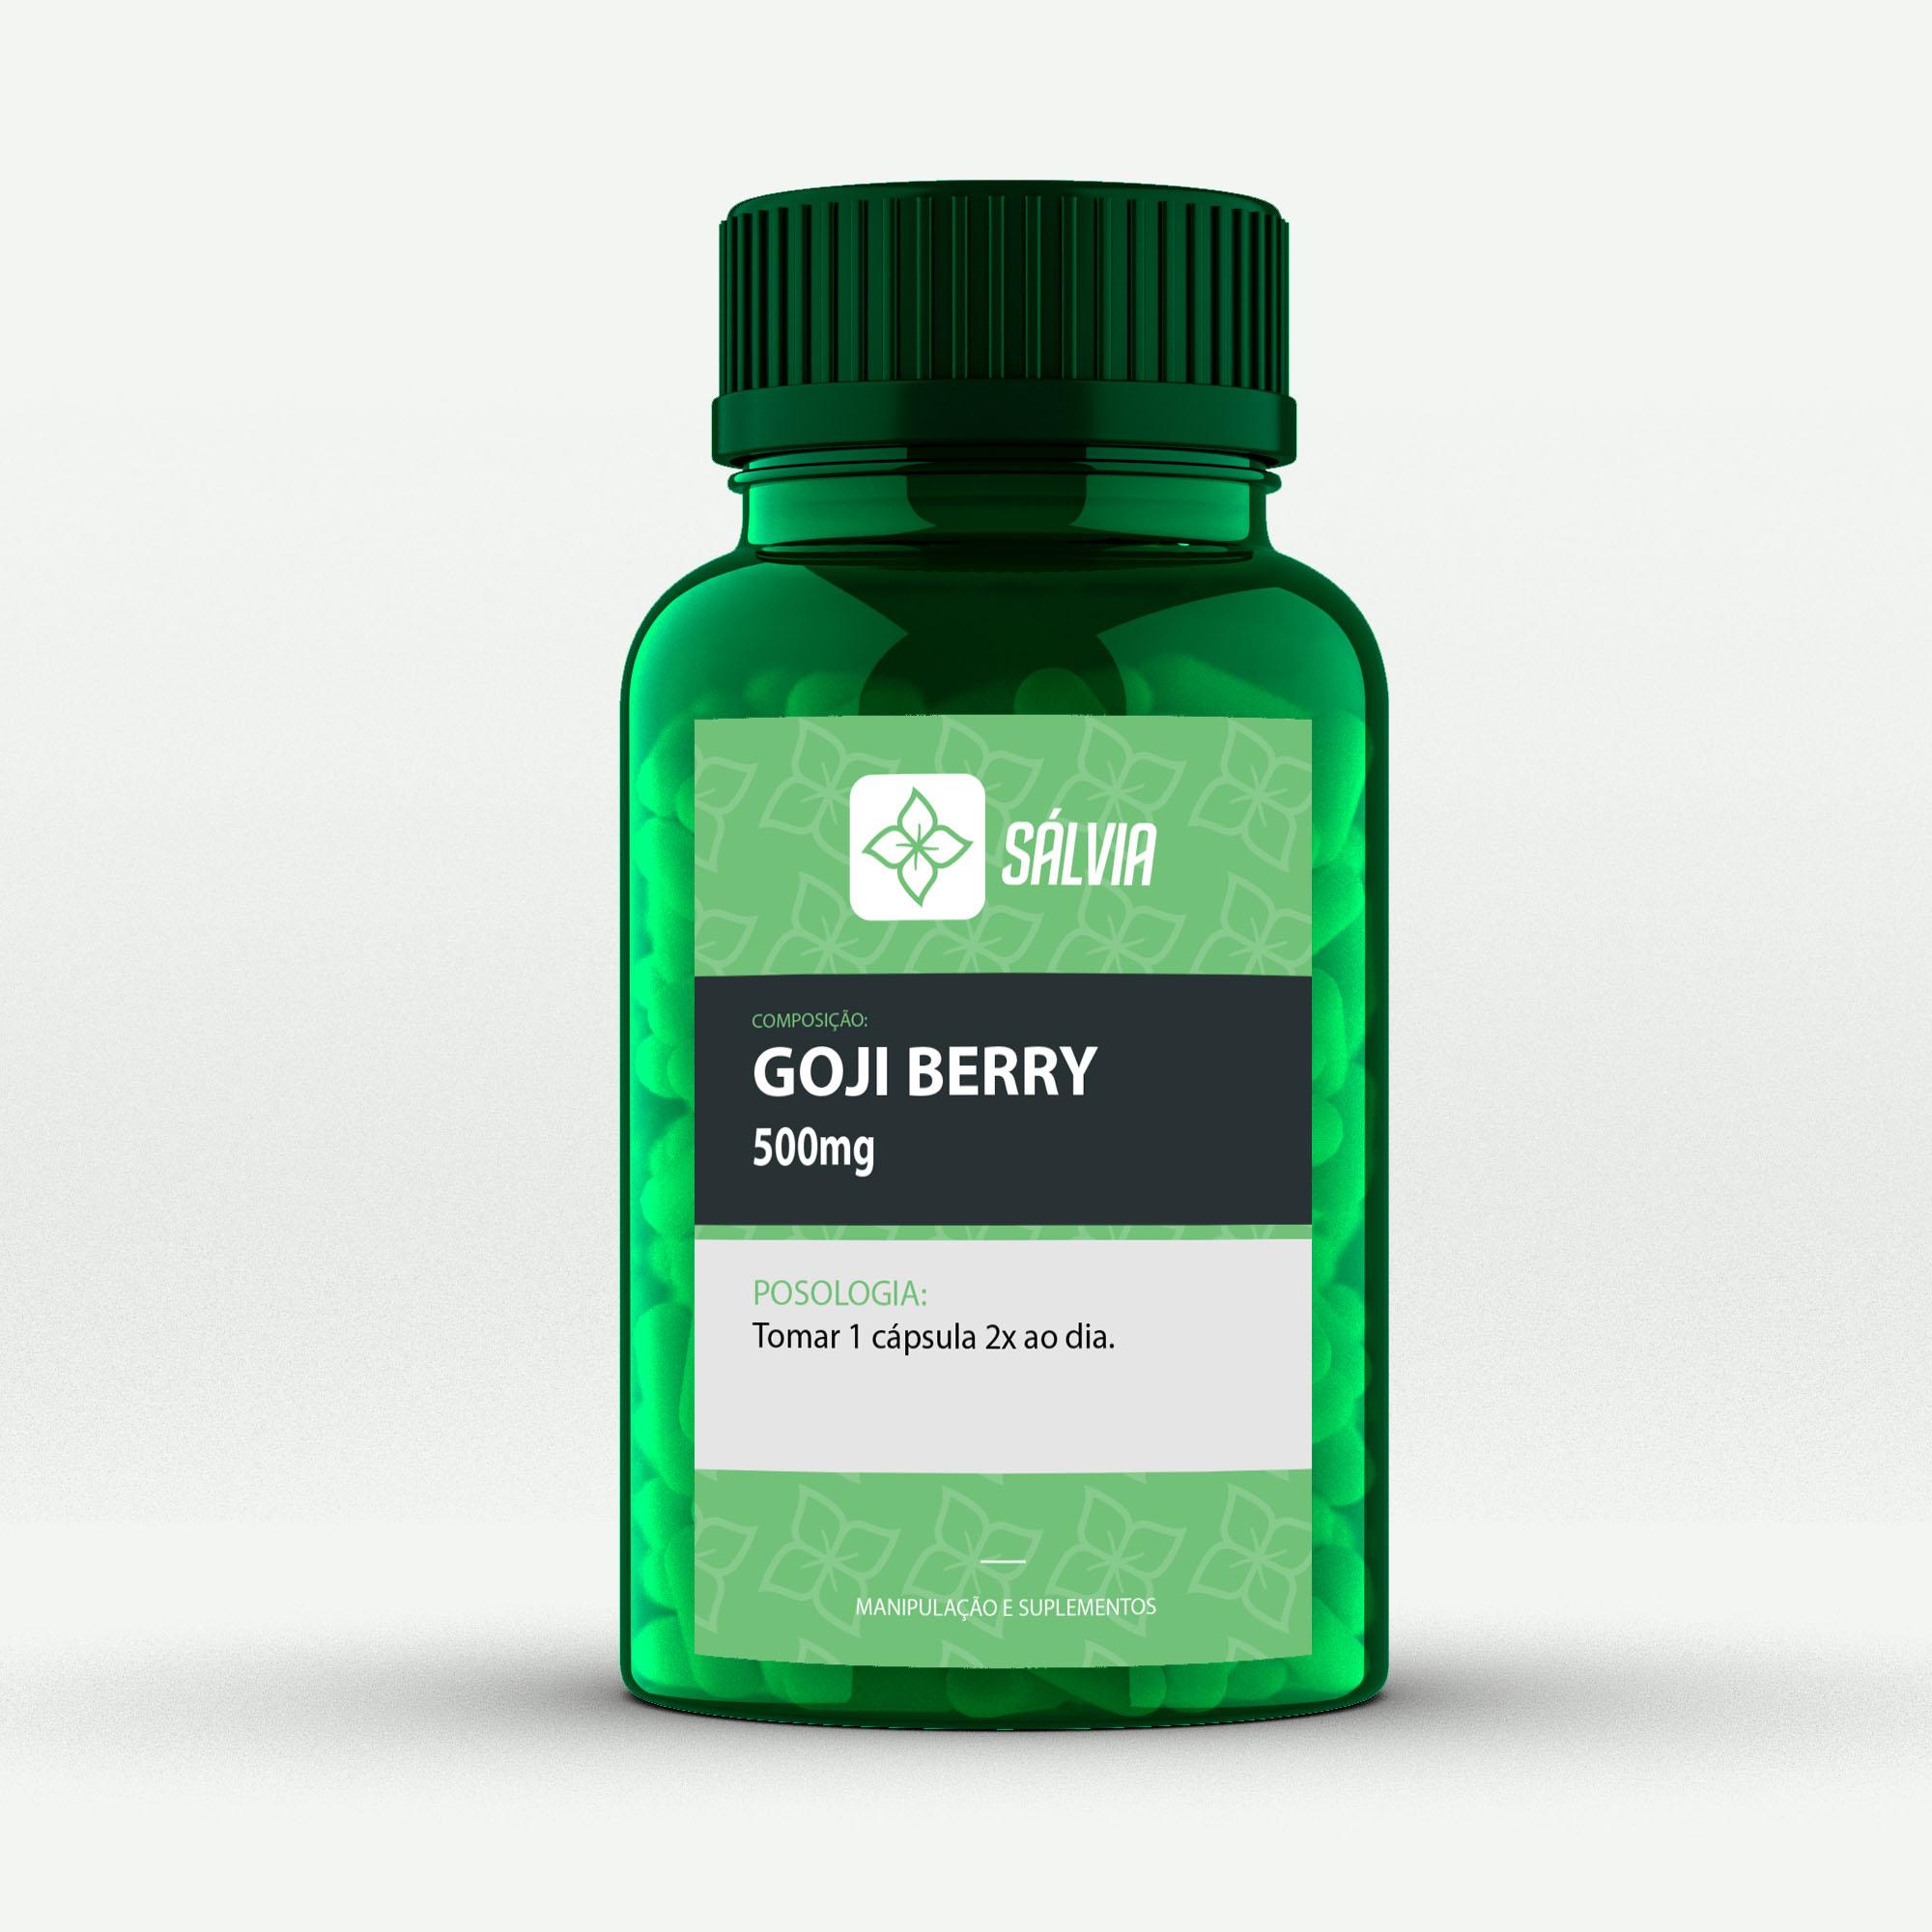 GOJI BERRY 500mg - Cápsulas